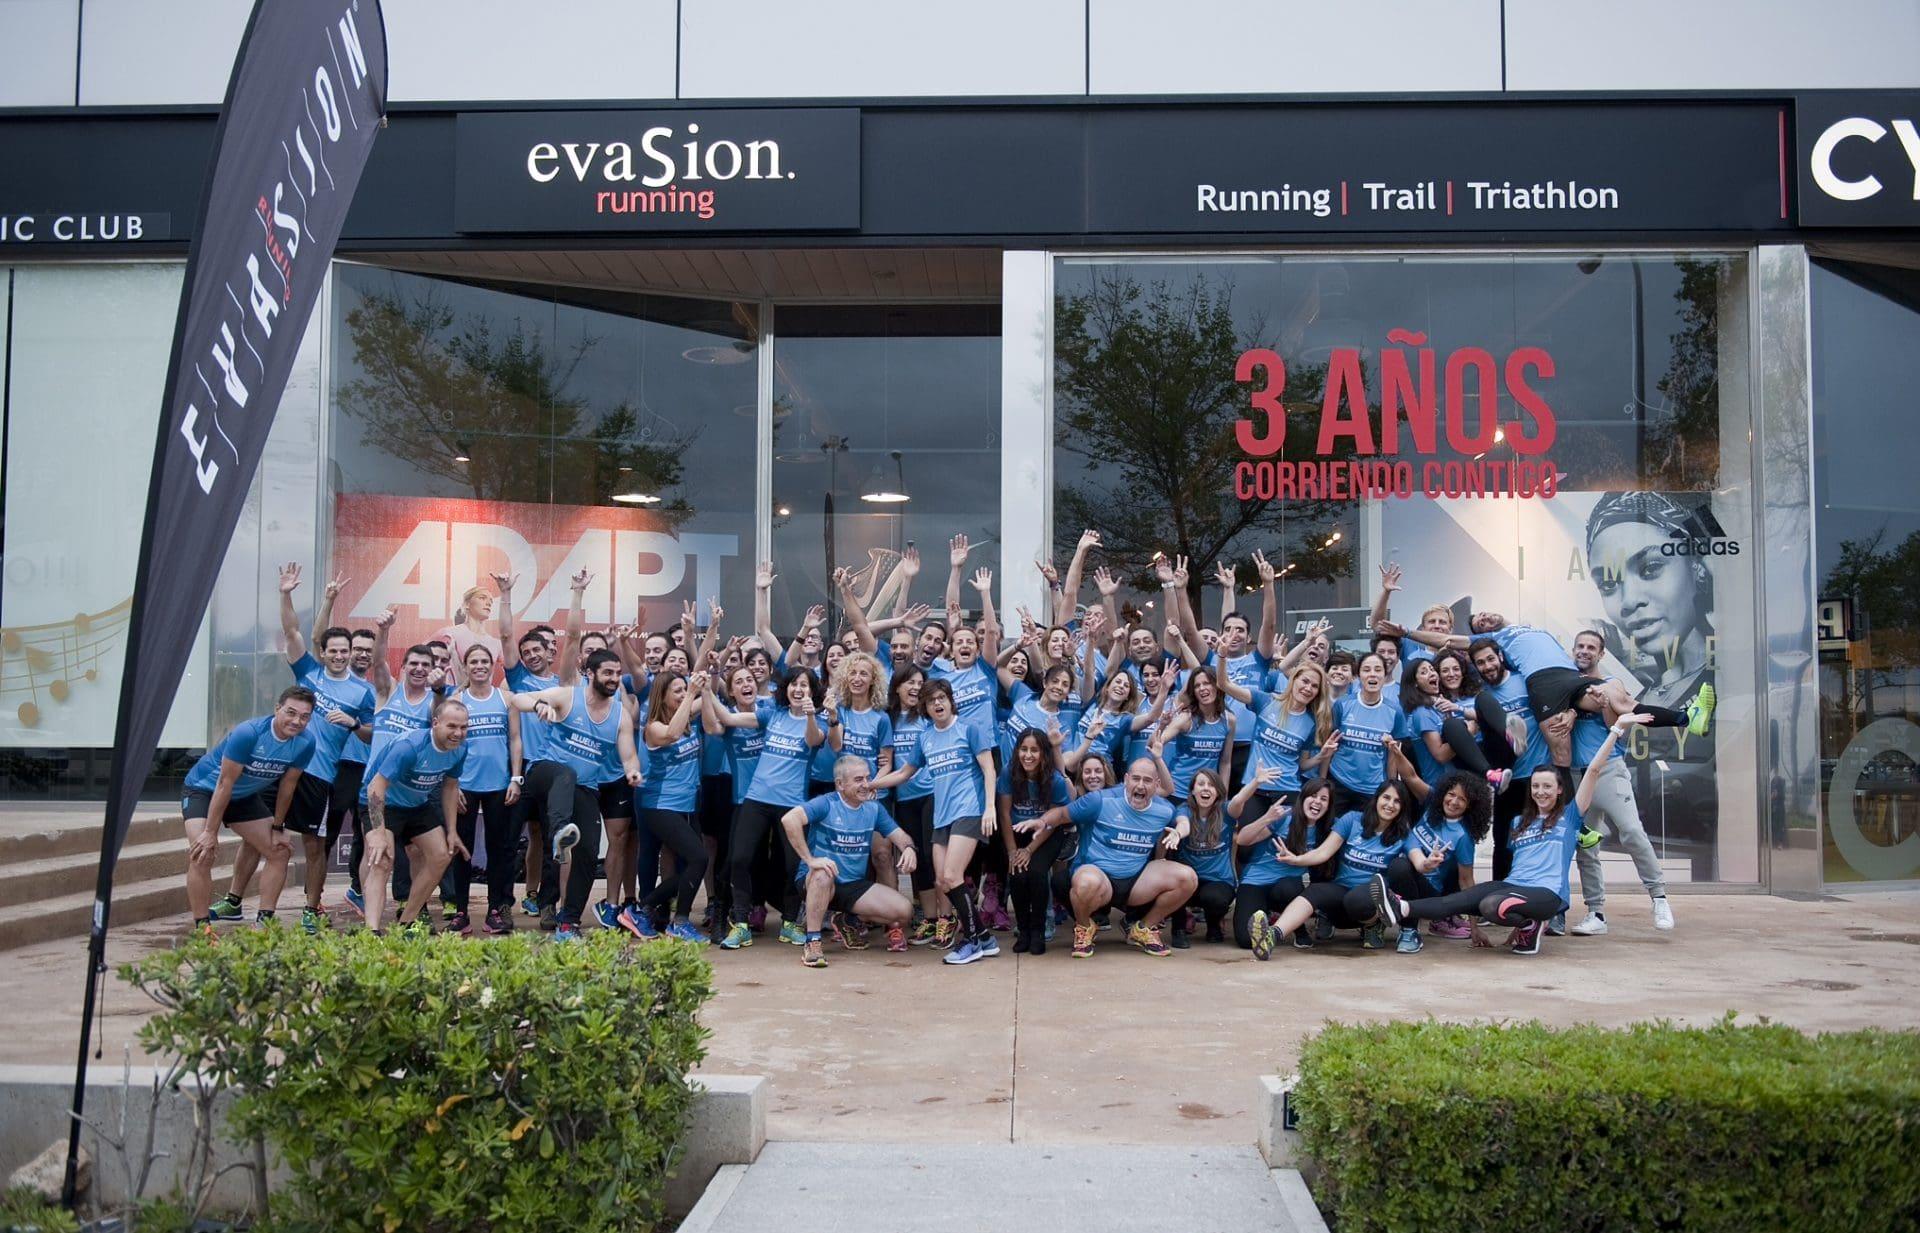 equipo-evasion-running-2